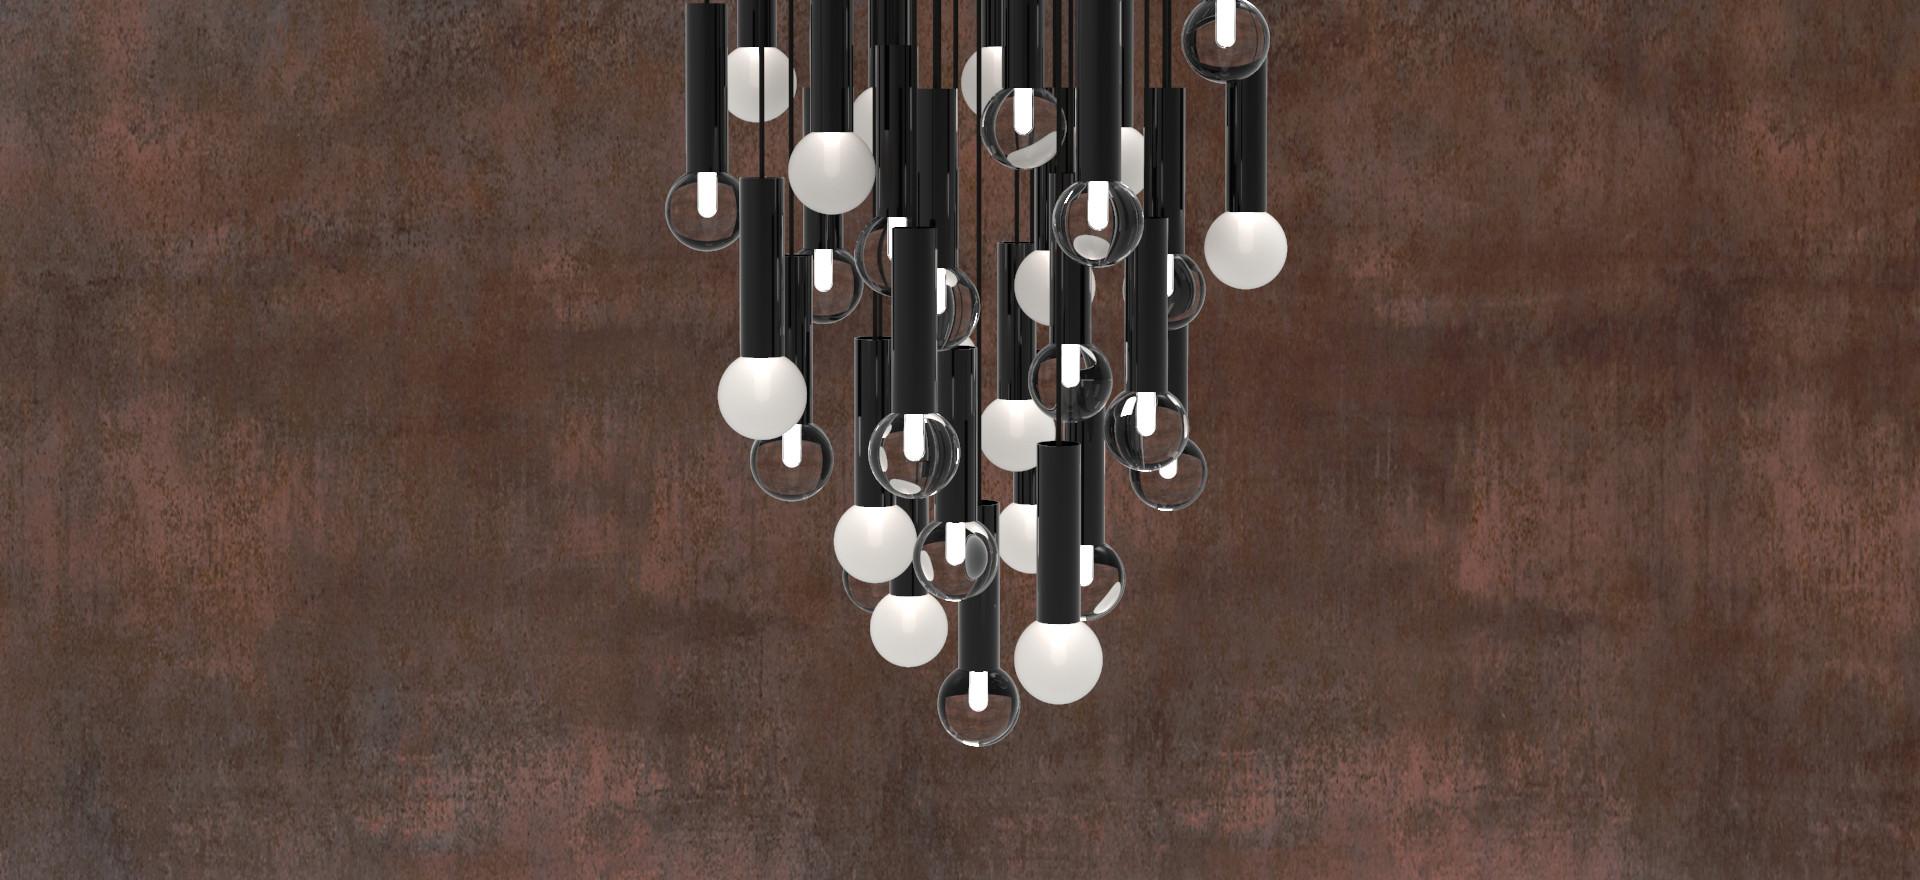 Lighting-Contrast Ratio-Kitchen Chandeli